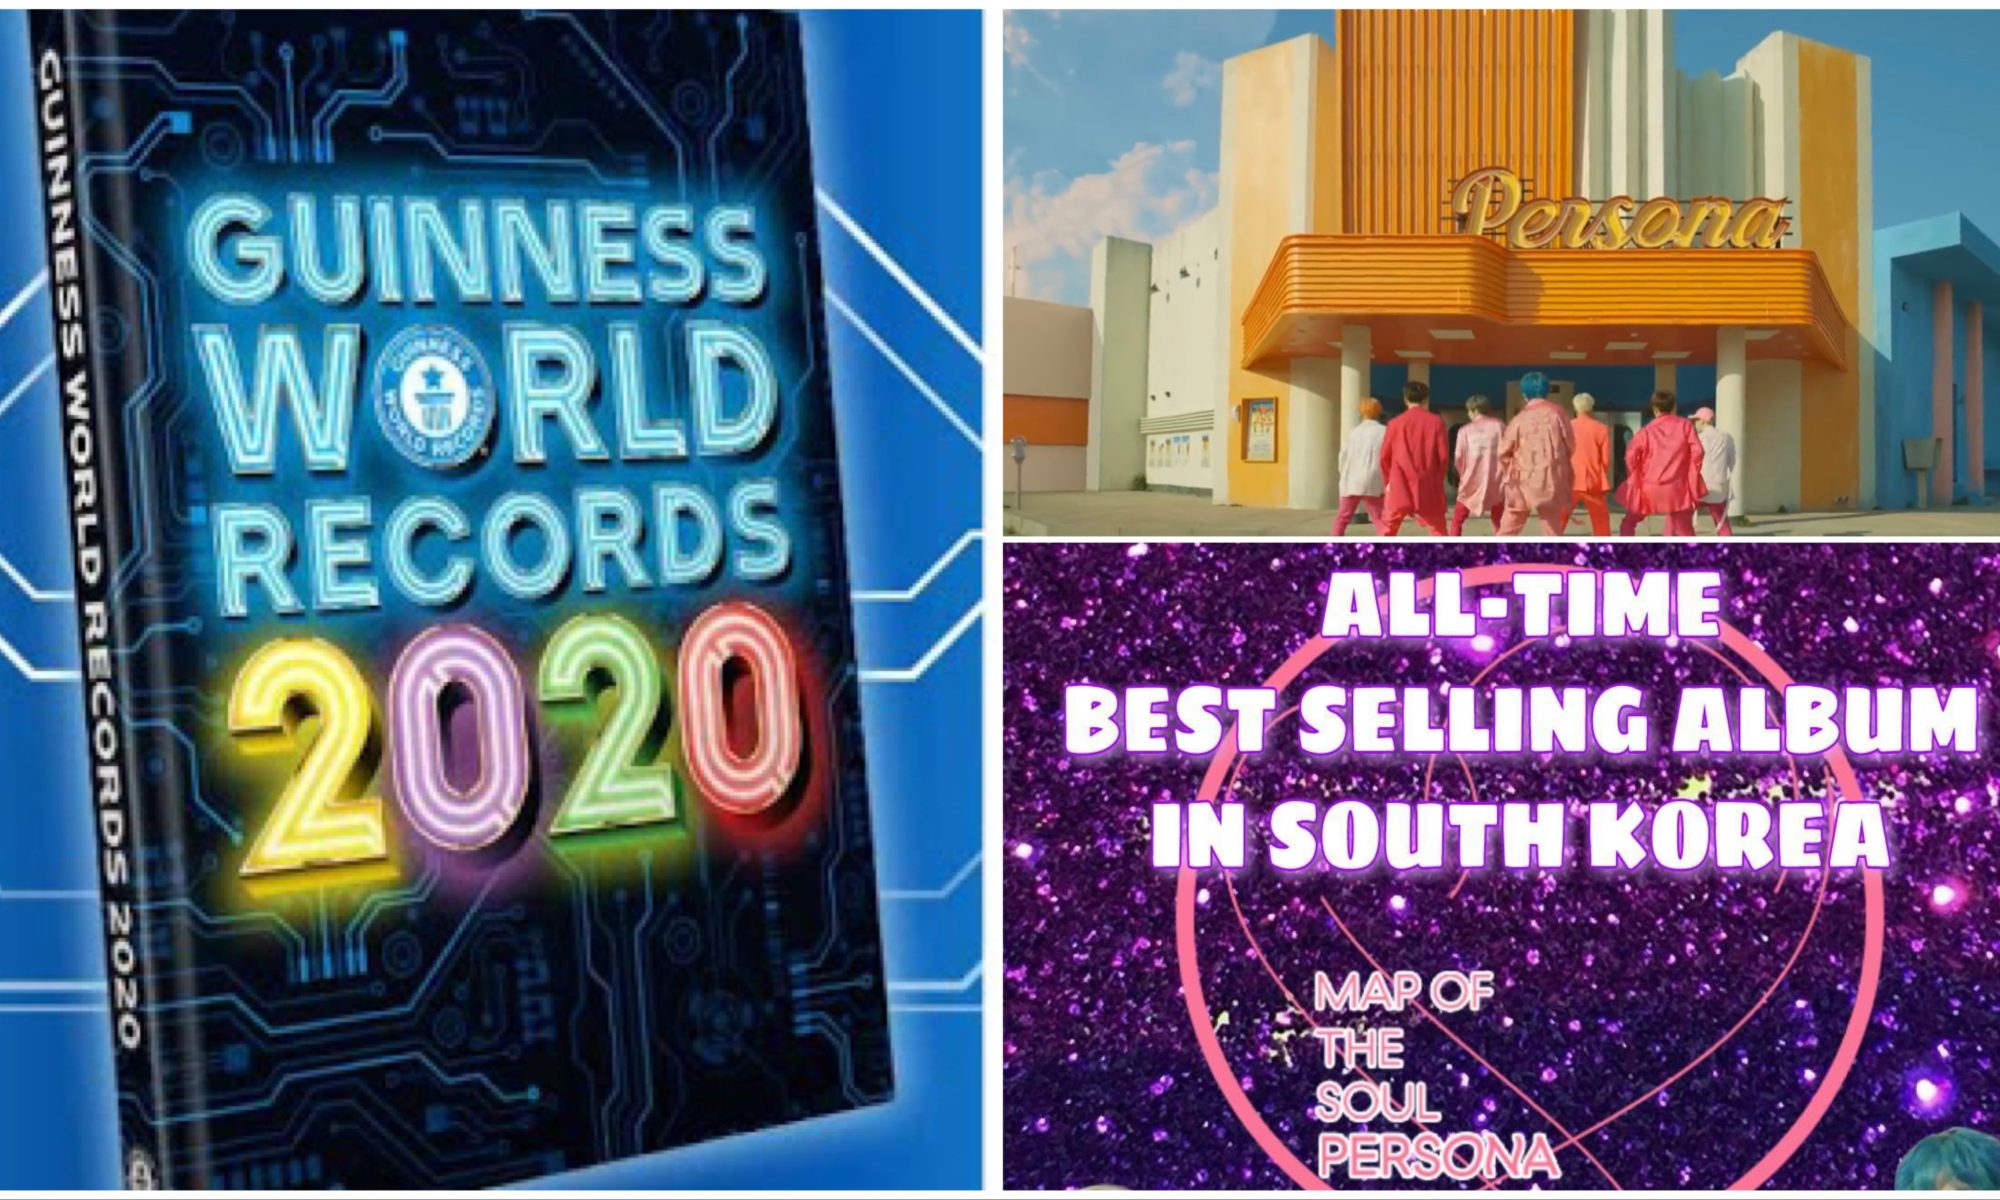 BTS Guinness Record